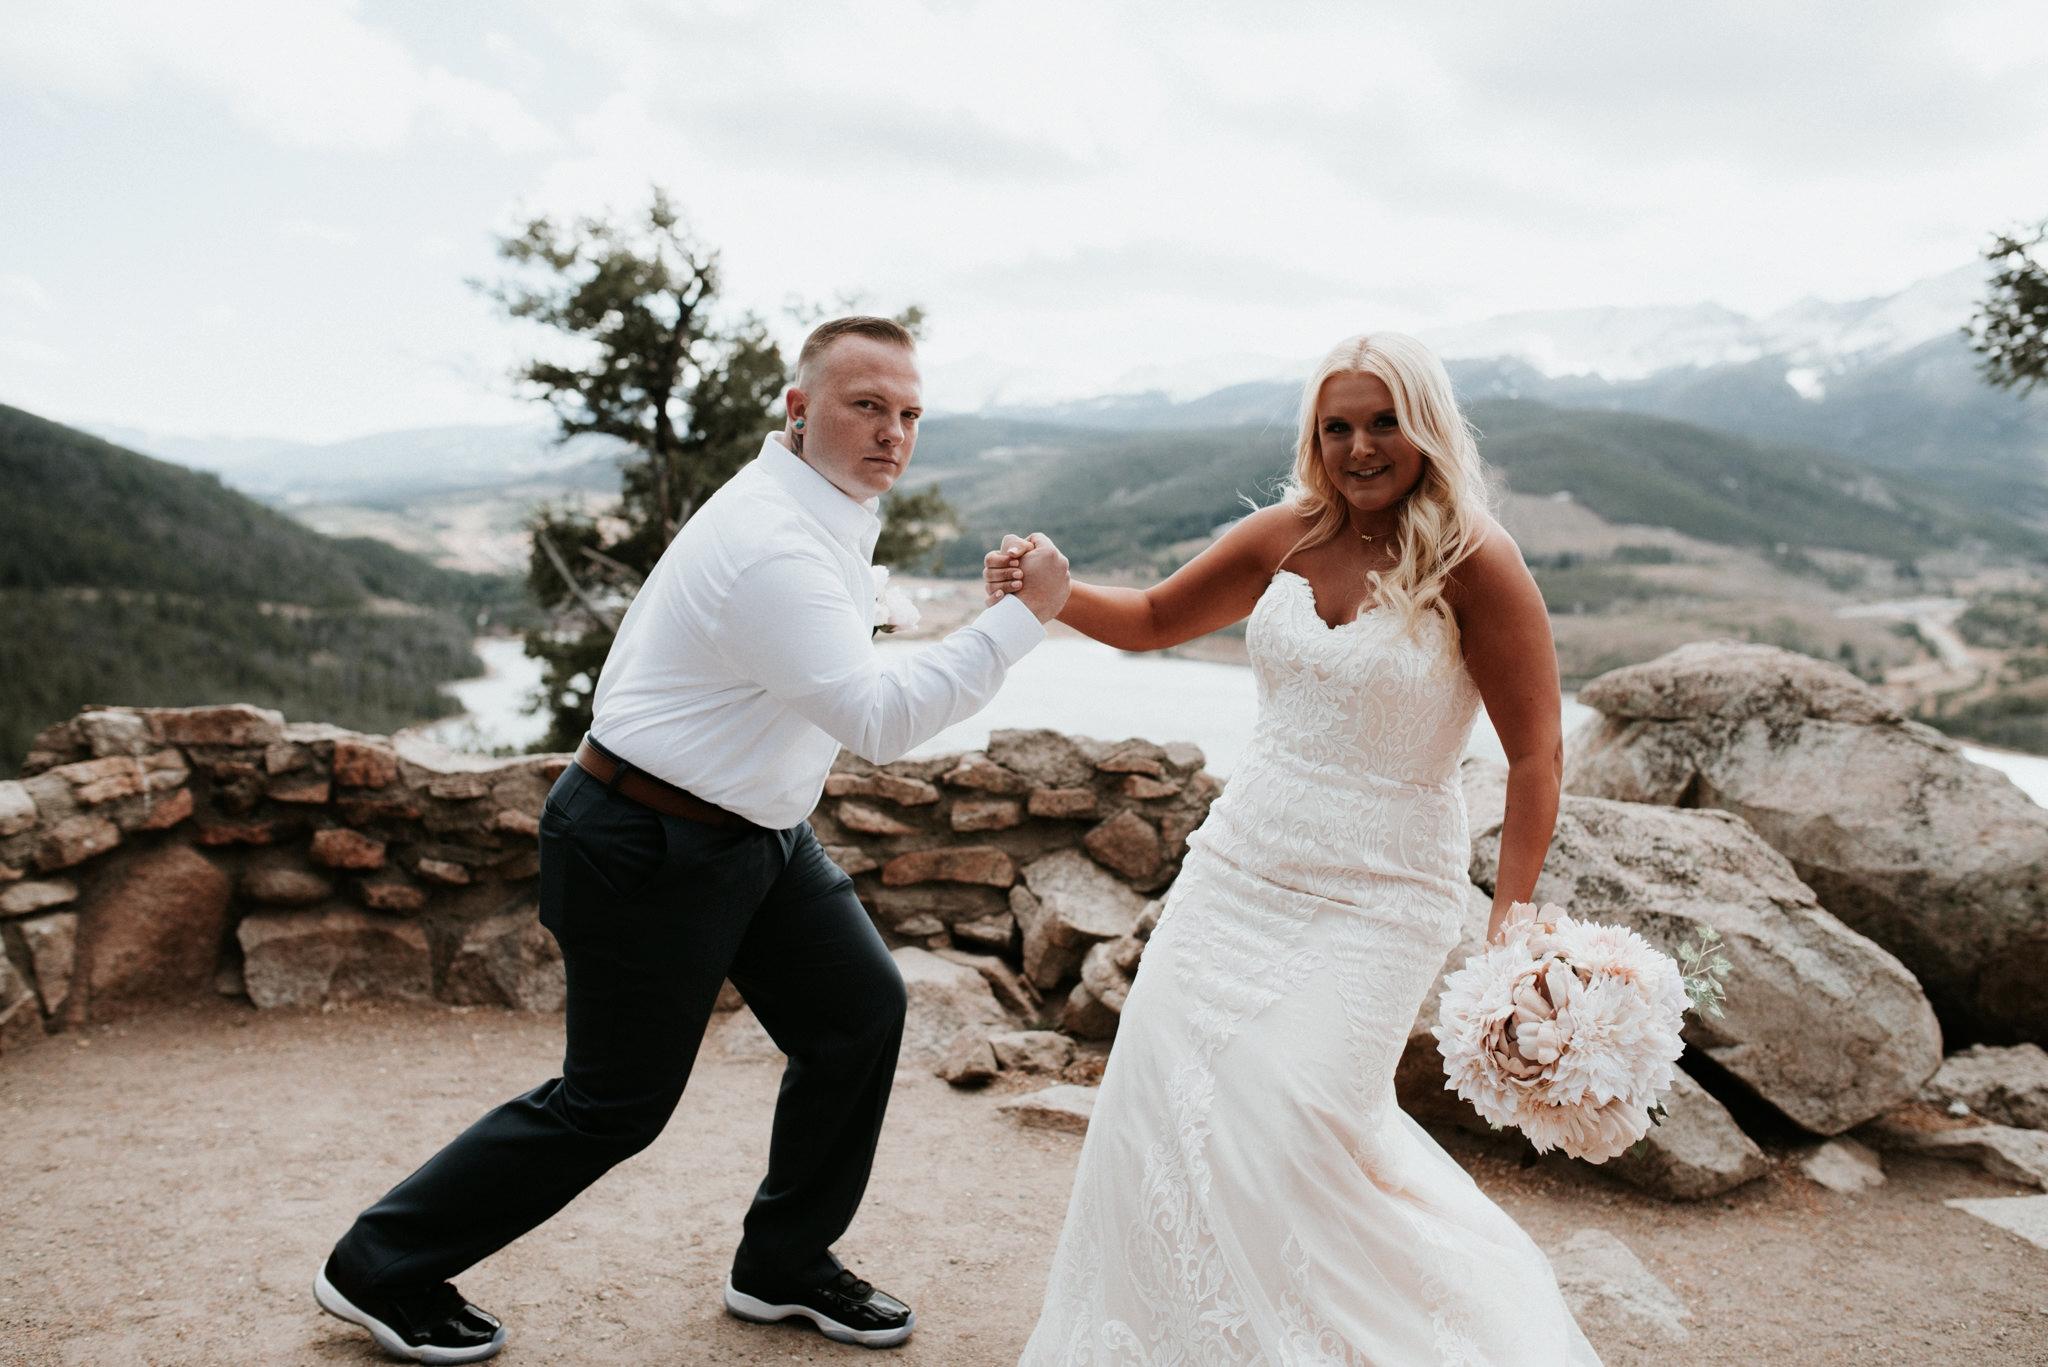 colorado elopement lake dillon sapphire point Zach&Rosalie St. Louis Wedding Photographer--41.jpg